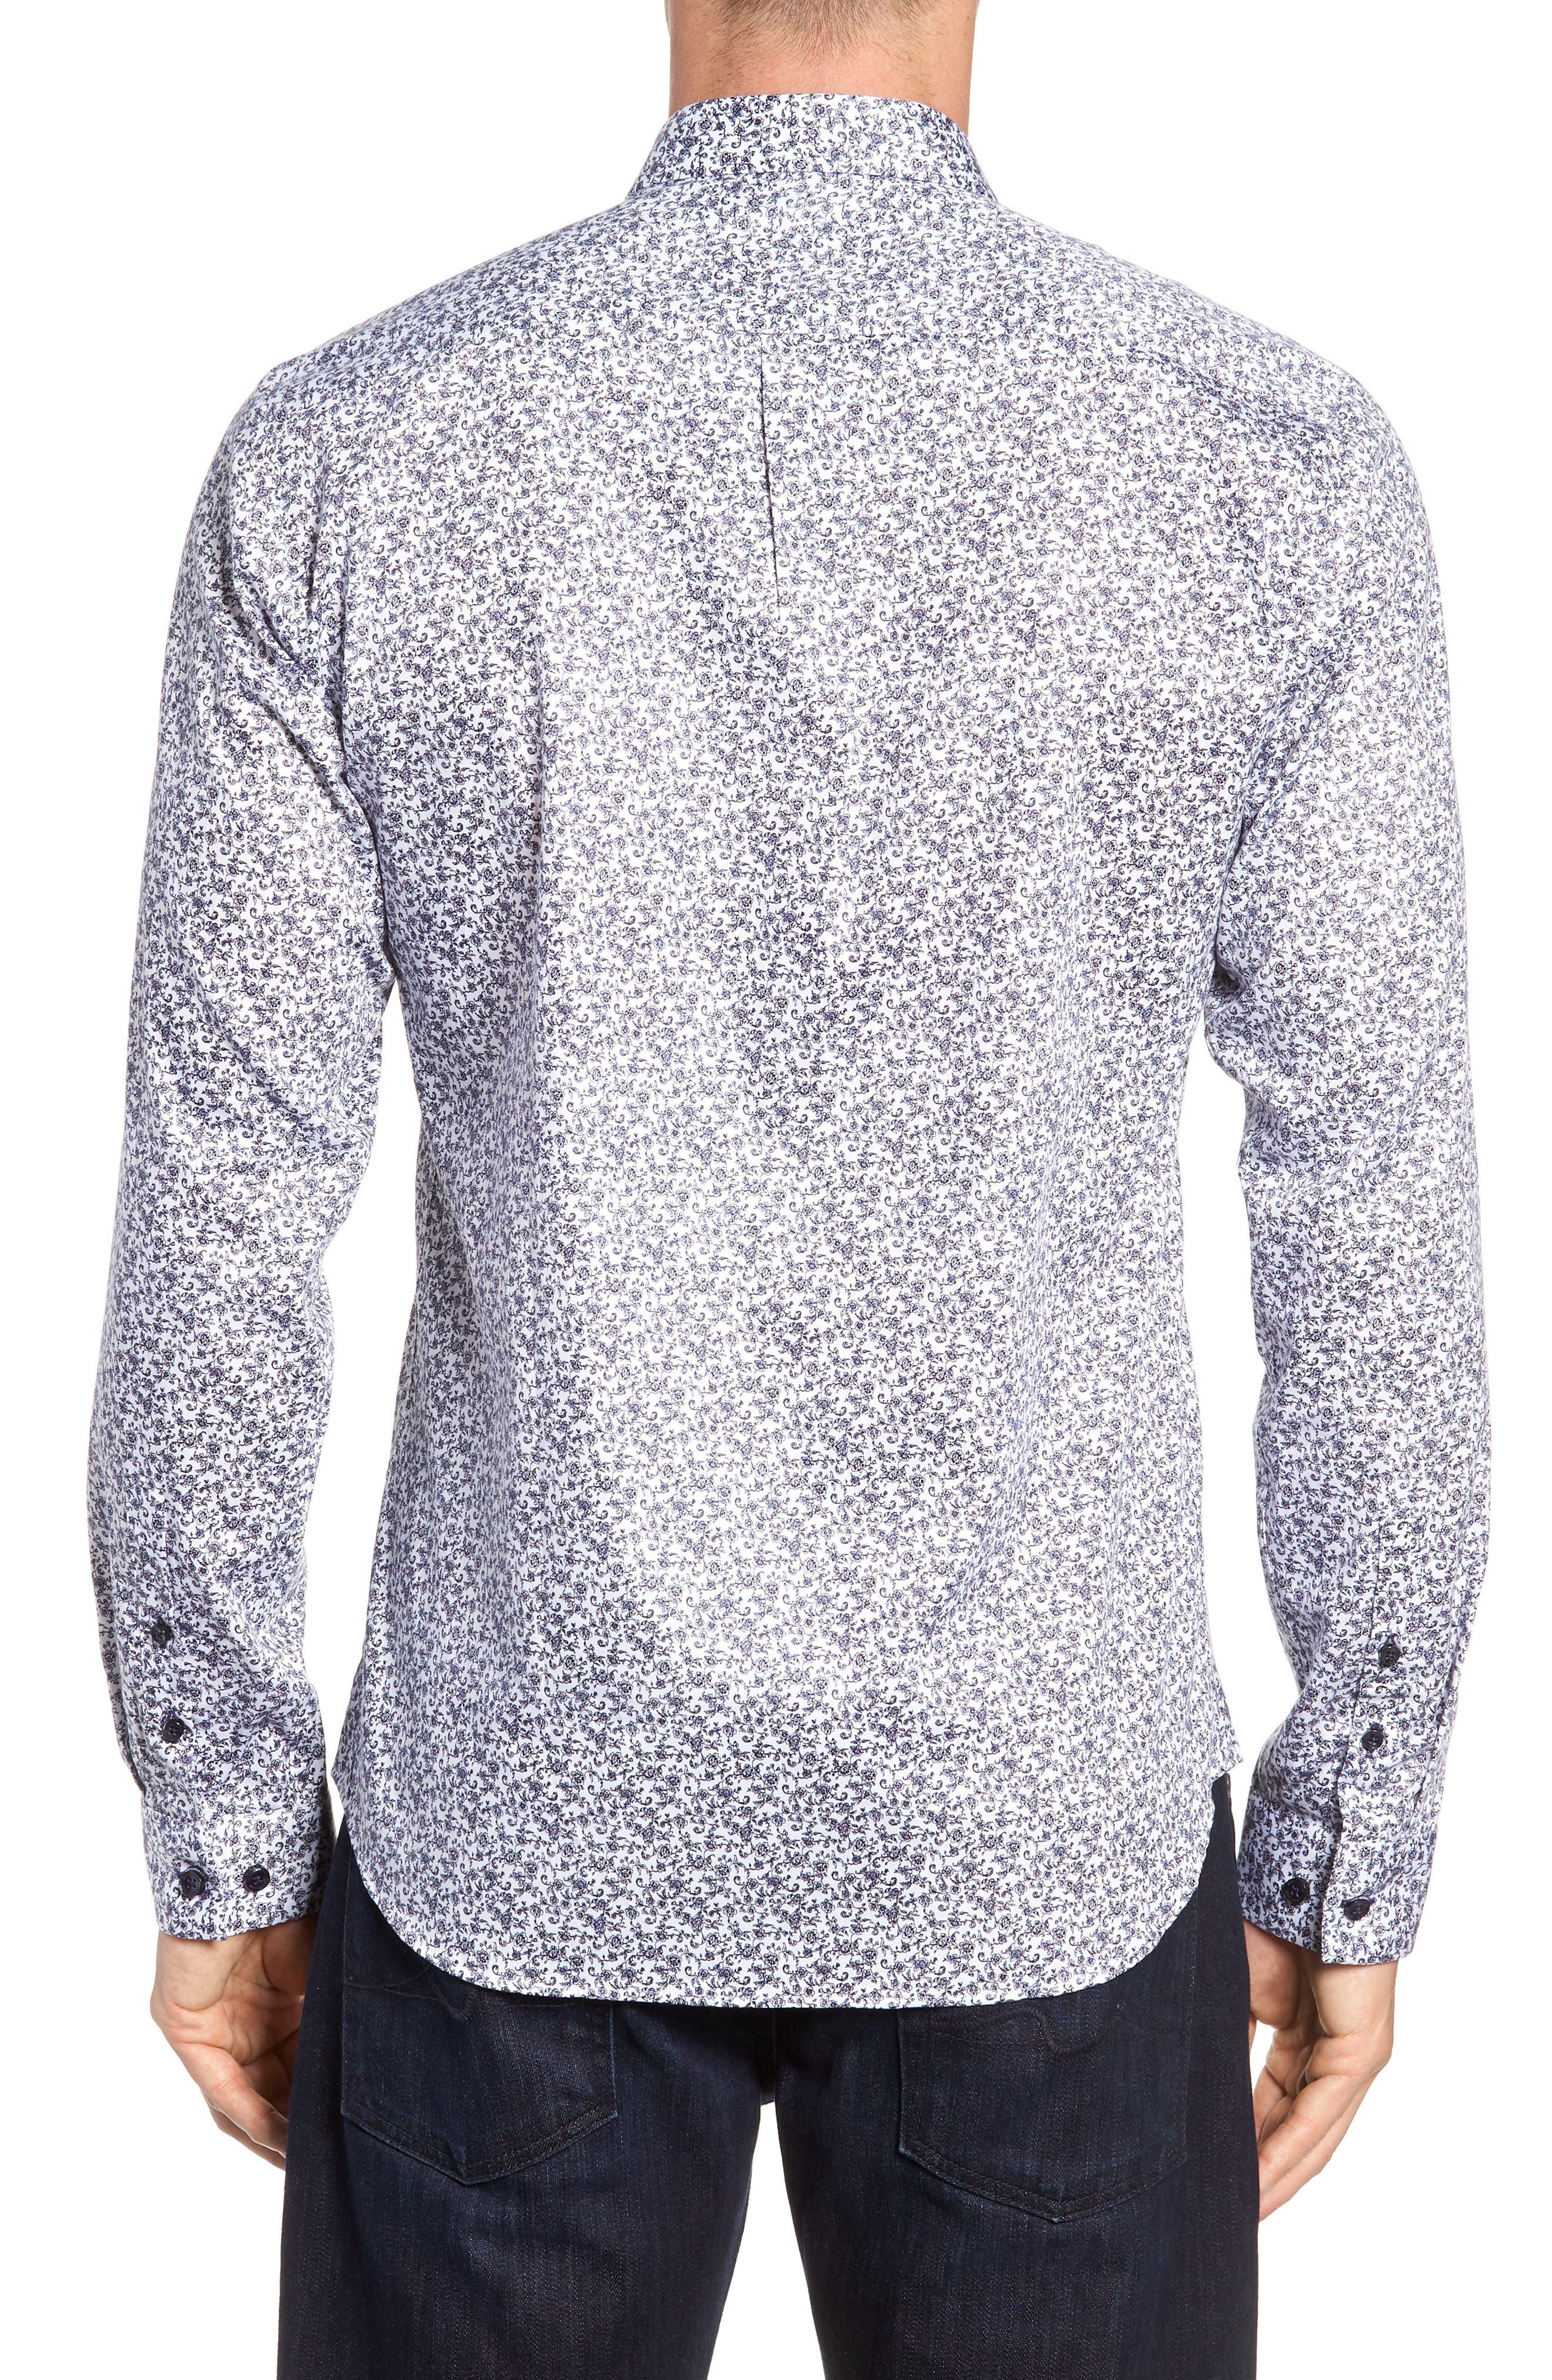 Floral Sport Shirt,                             Alternate thumbnail 4, color,                             White Navy Print